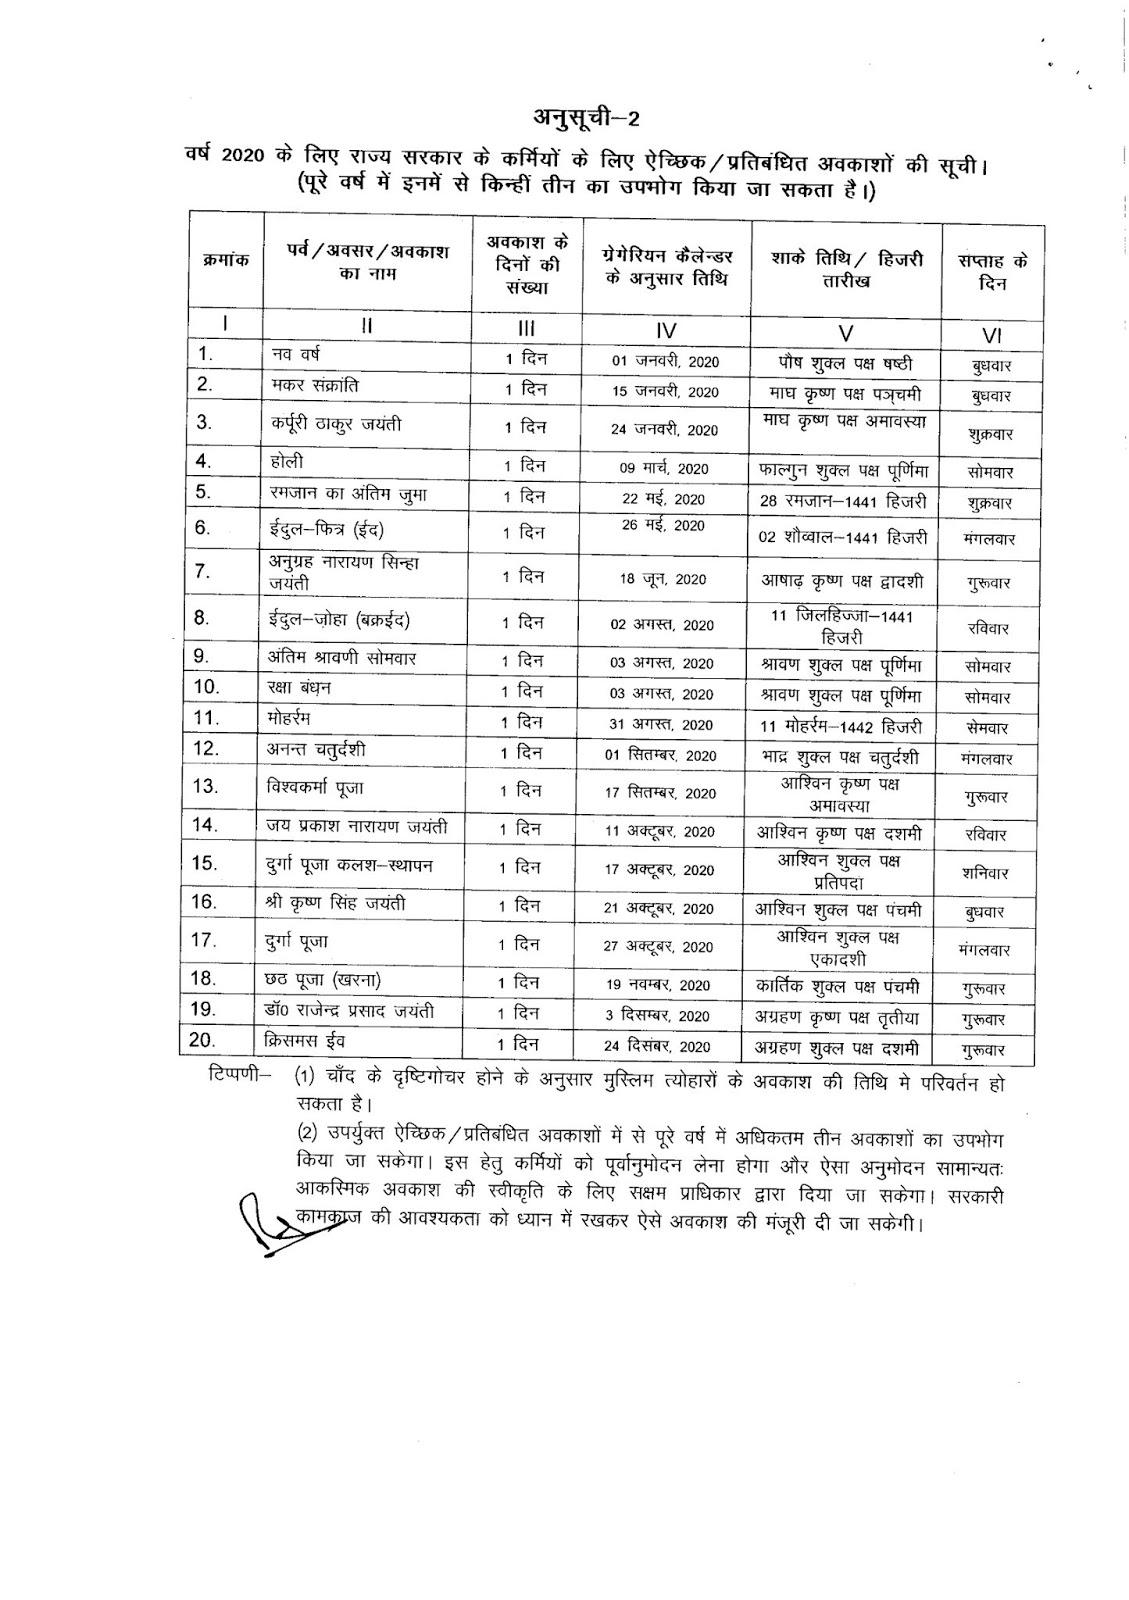 Bihar Government Calendar 2020 #educratsweb inside Bihar Goverment Calender 2020